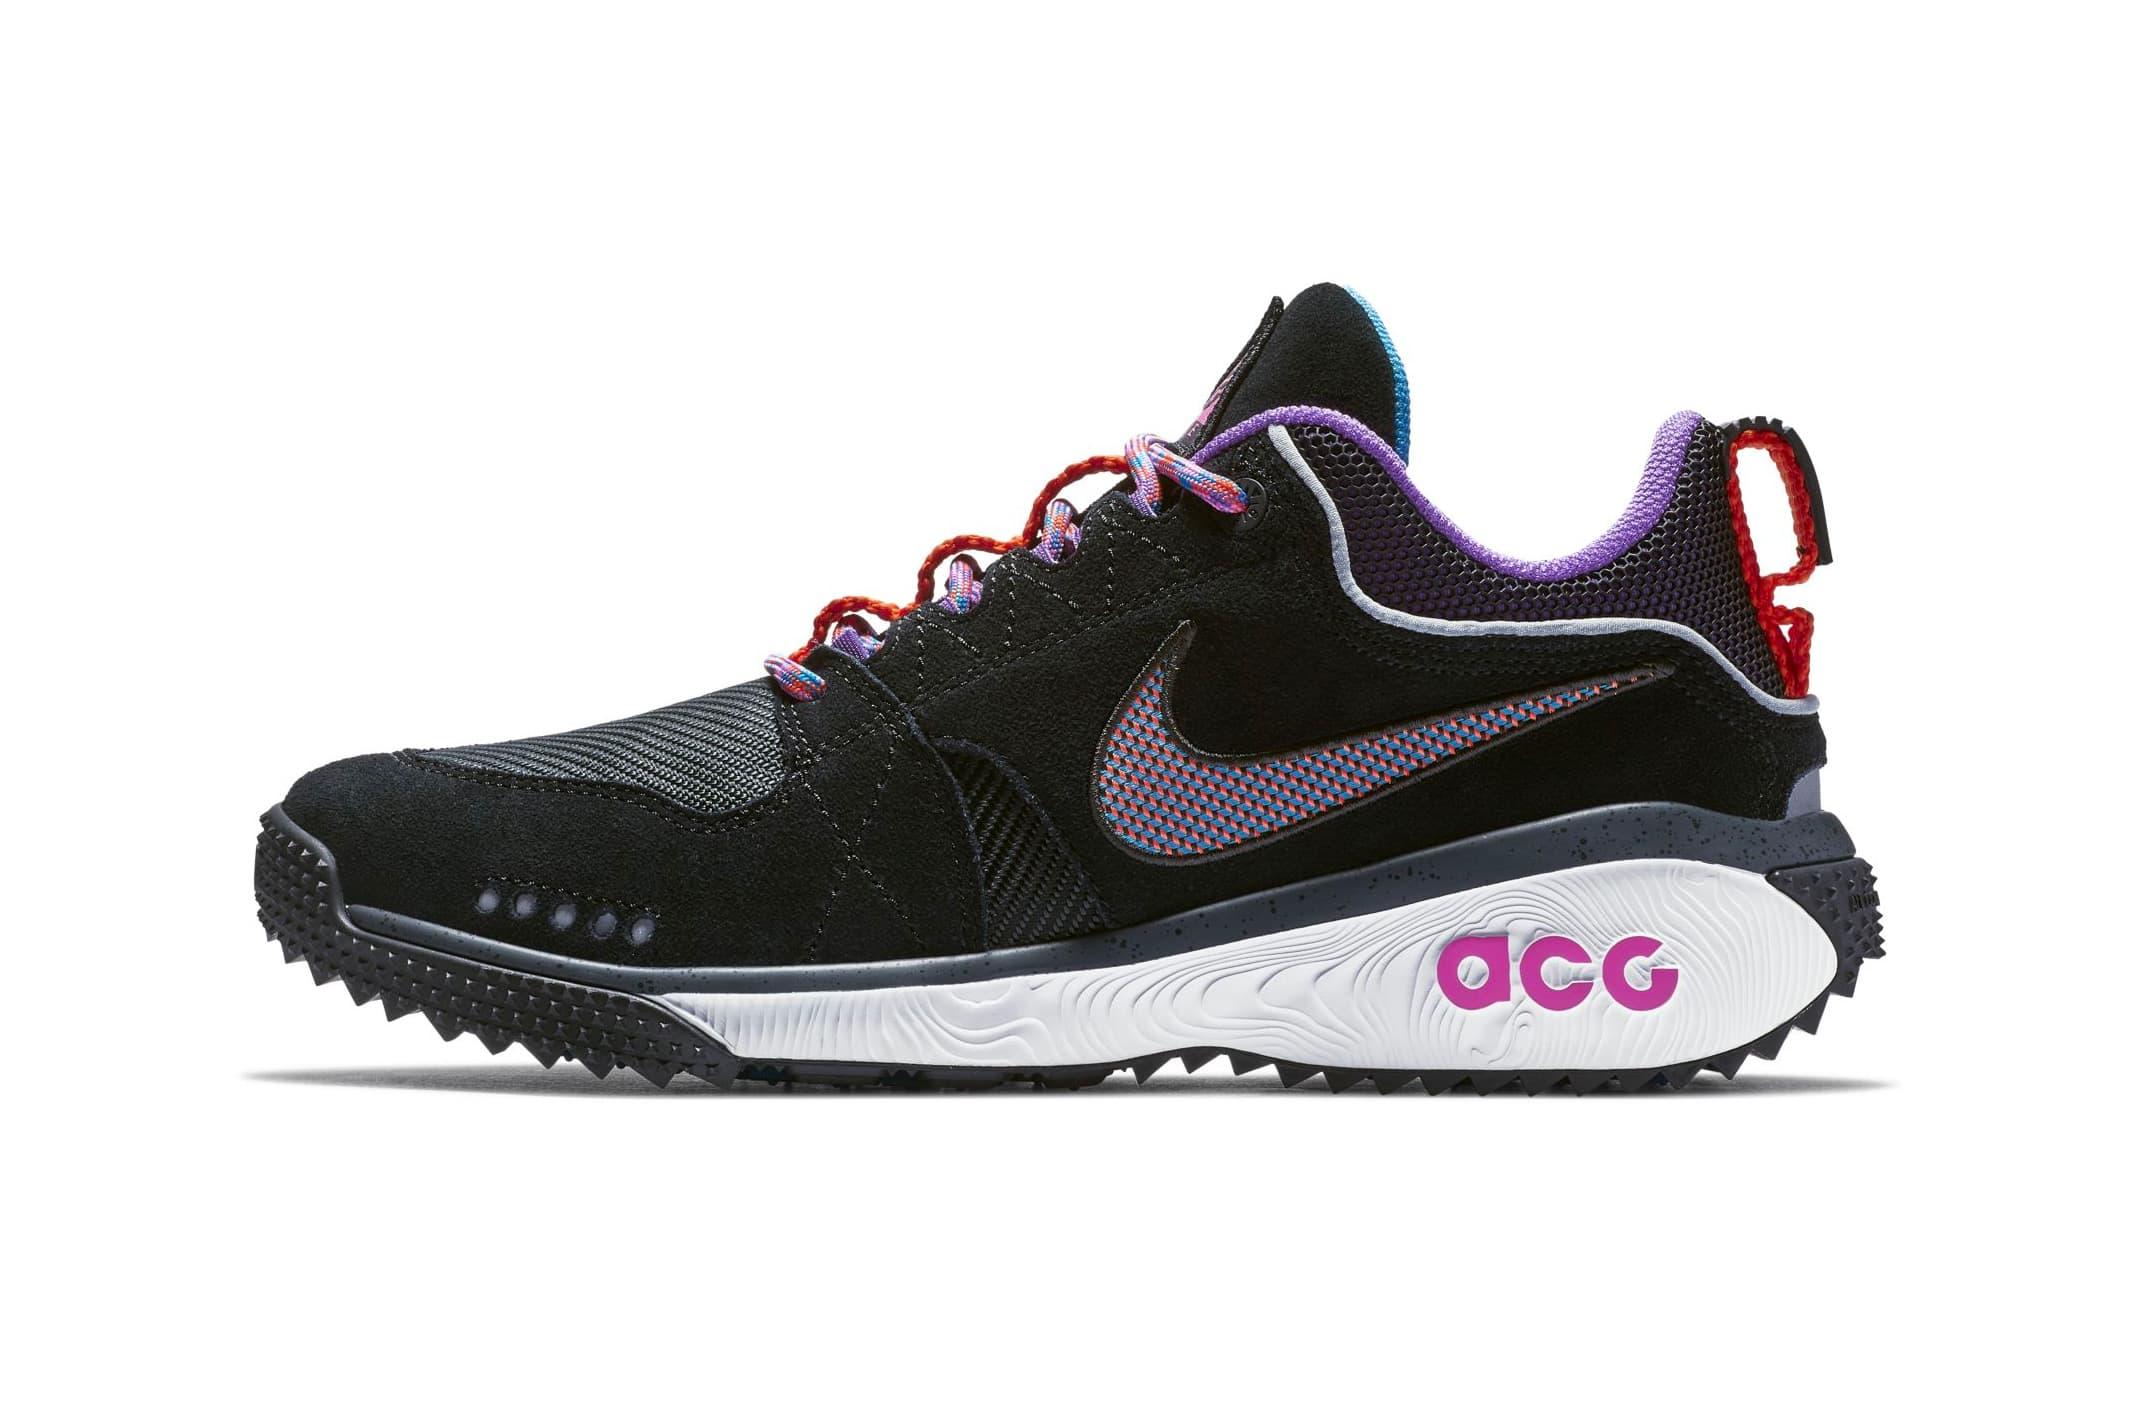 Nike ACG Dog Mountain Model Debuts in Two Colorways